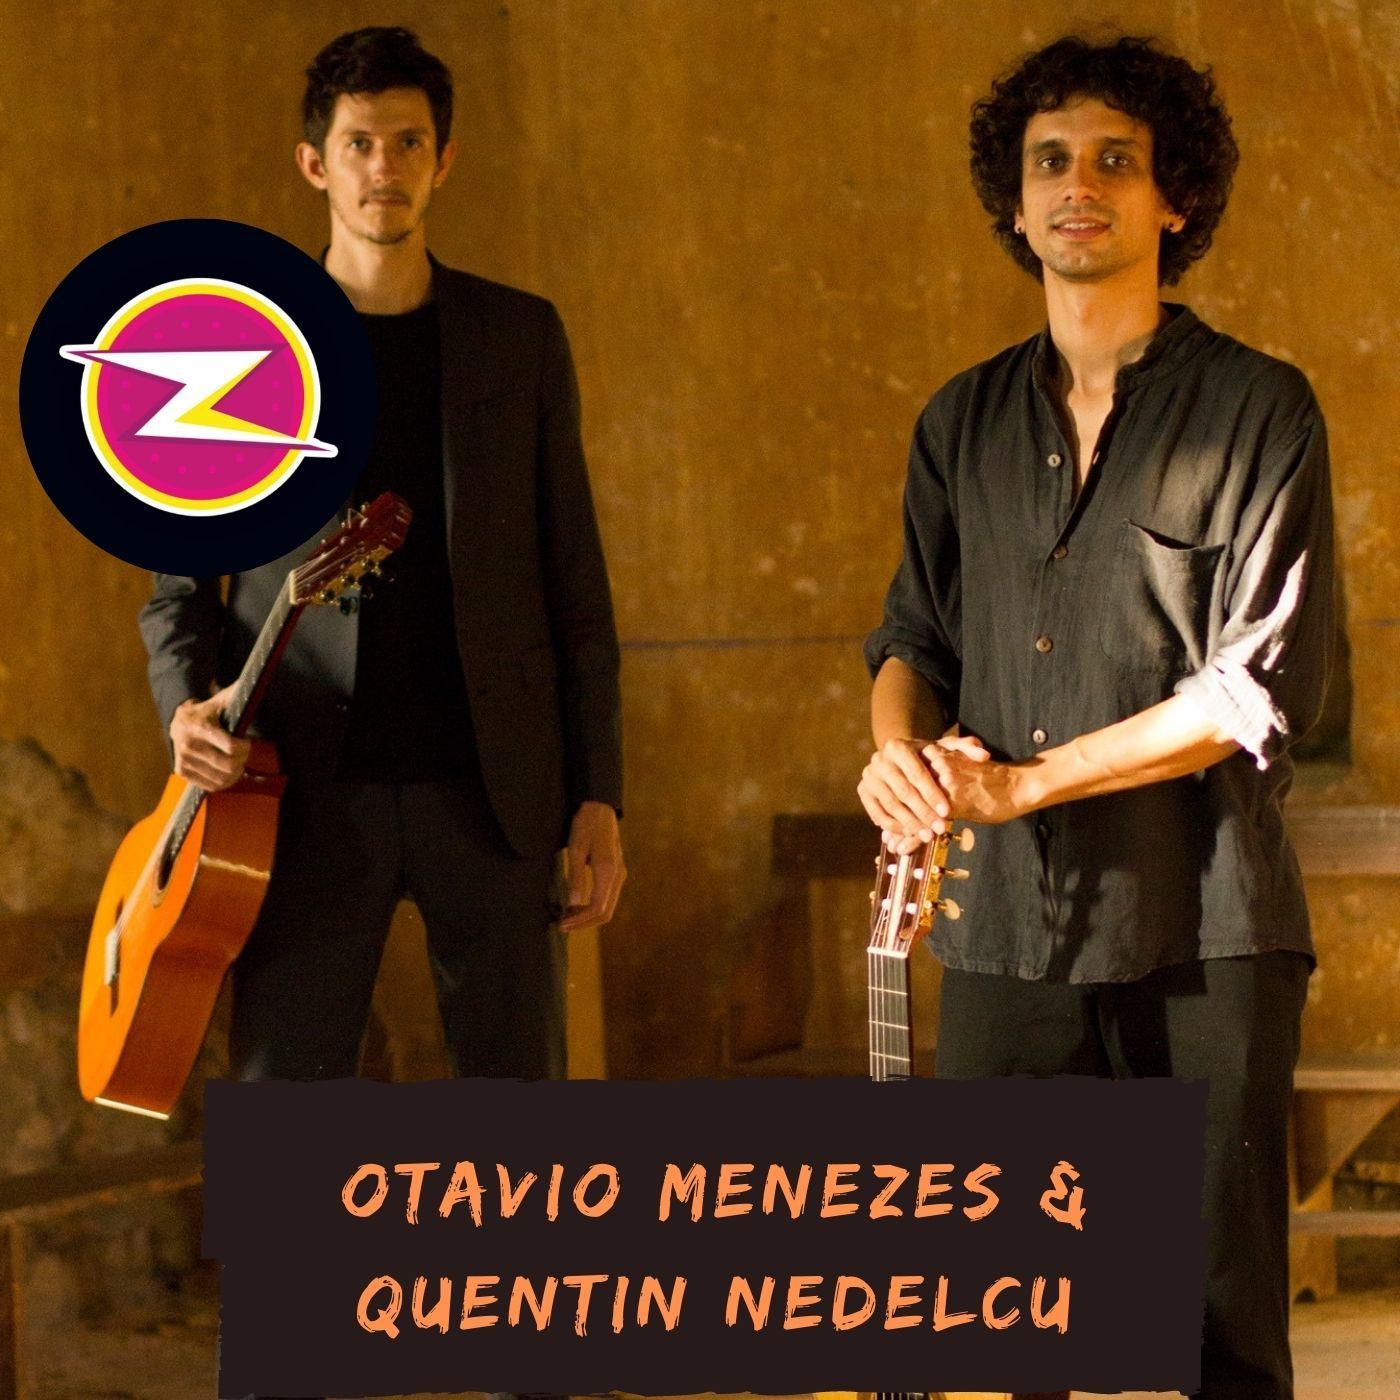 Otavio Menezes et Quentin Nelescu